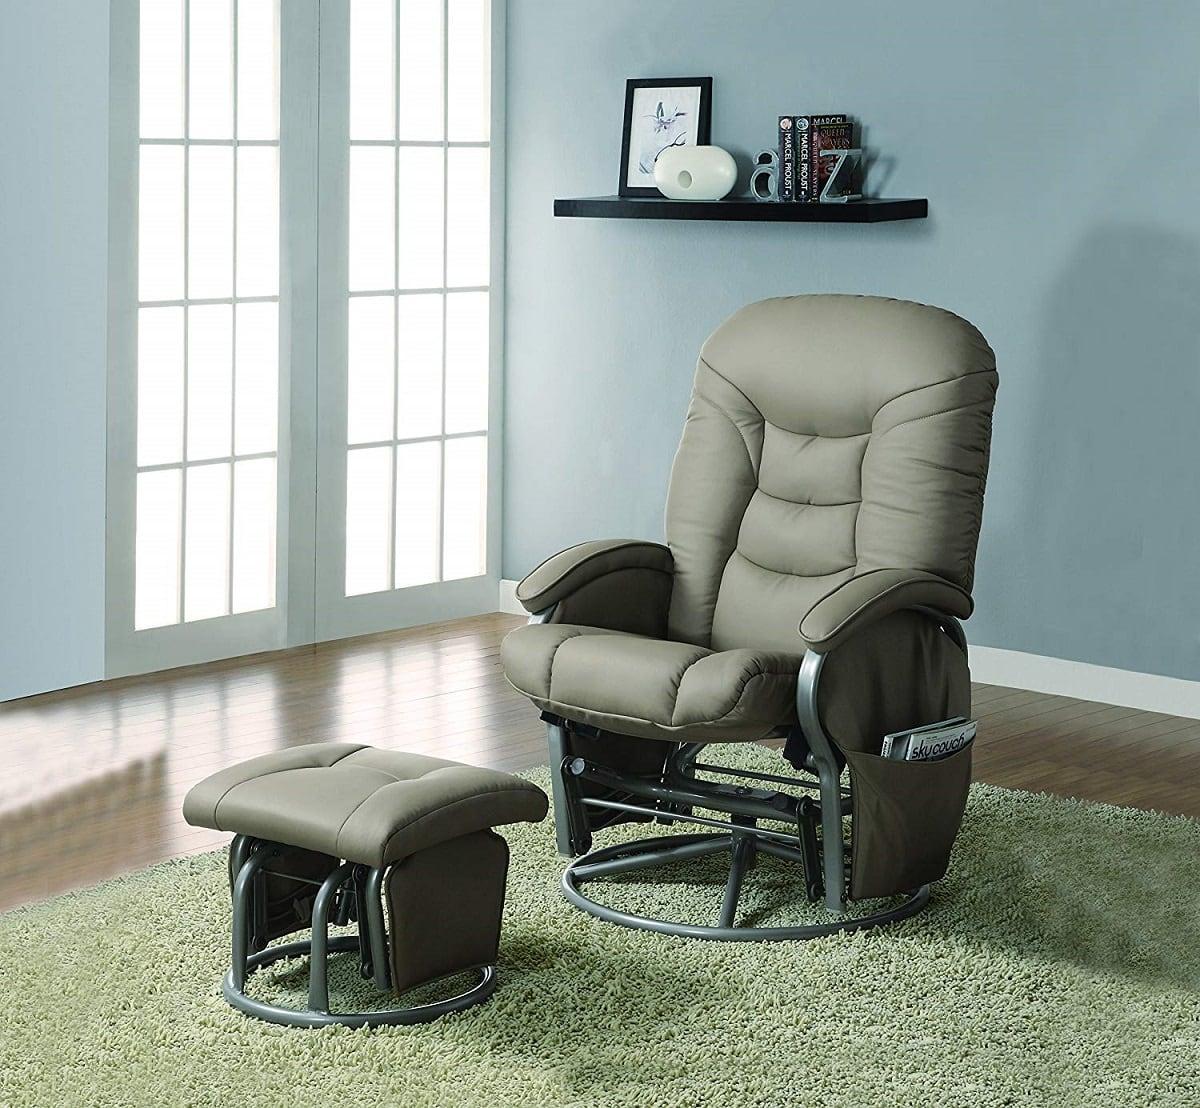 leatherette glider recliner image